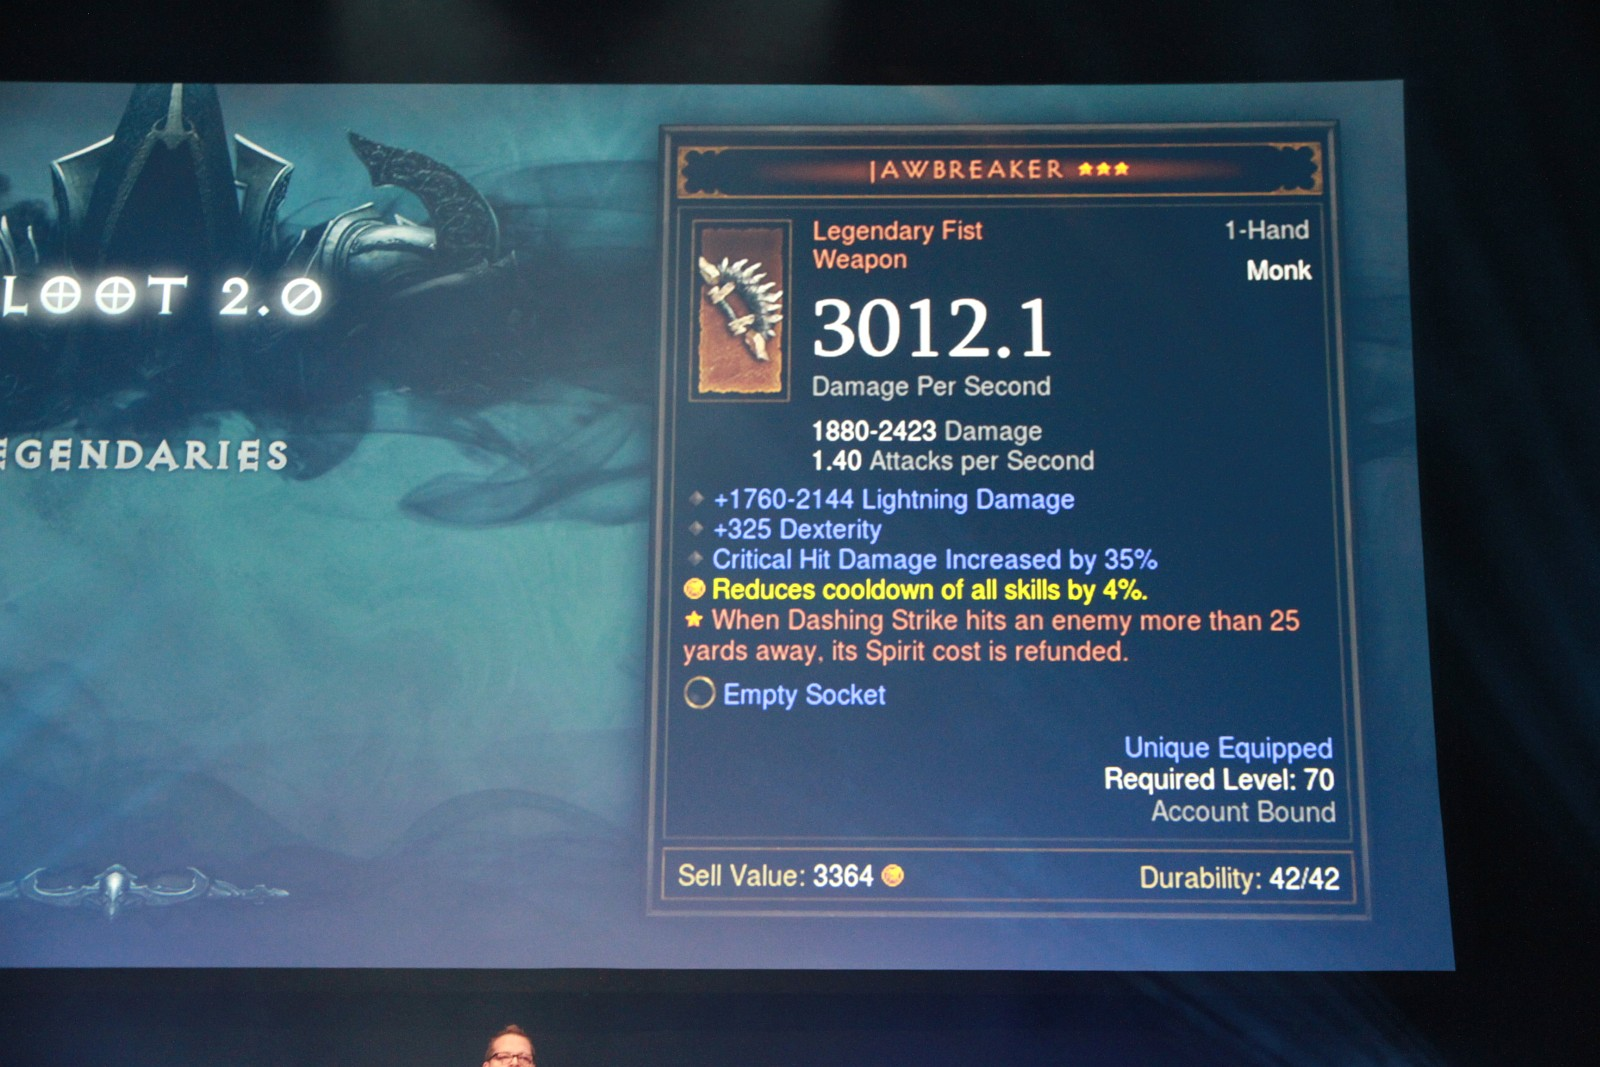 Reaper of souls nouvelle extension de Diablo III 8434149128